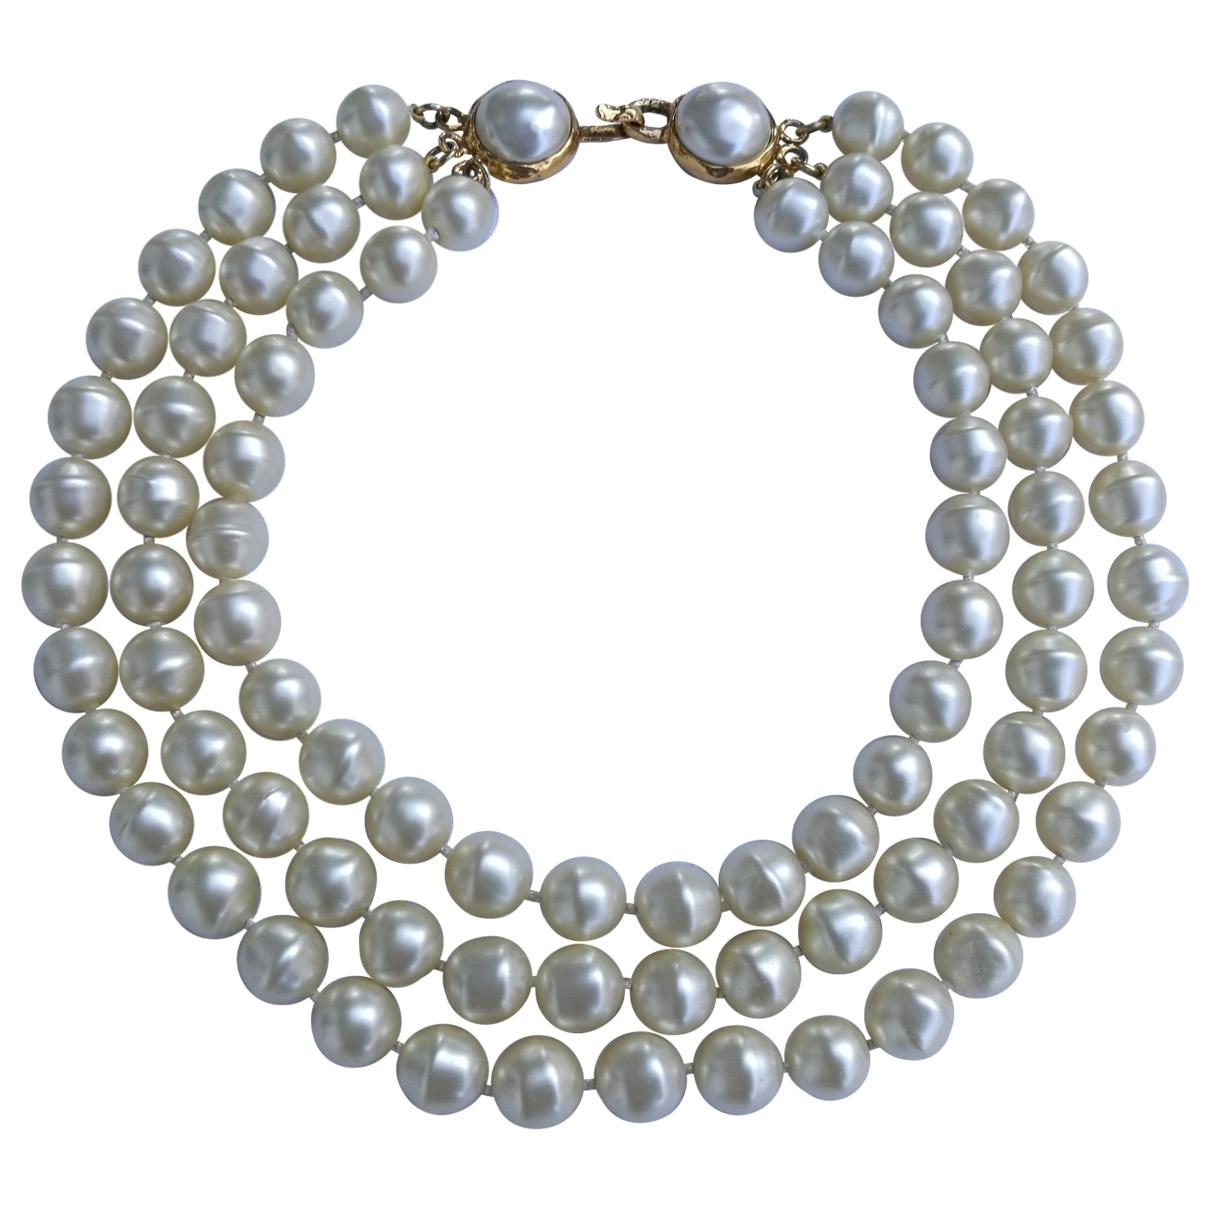 Chanel \N Ecru Pearls necklace for Women \N